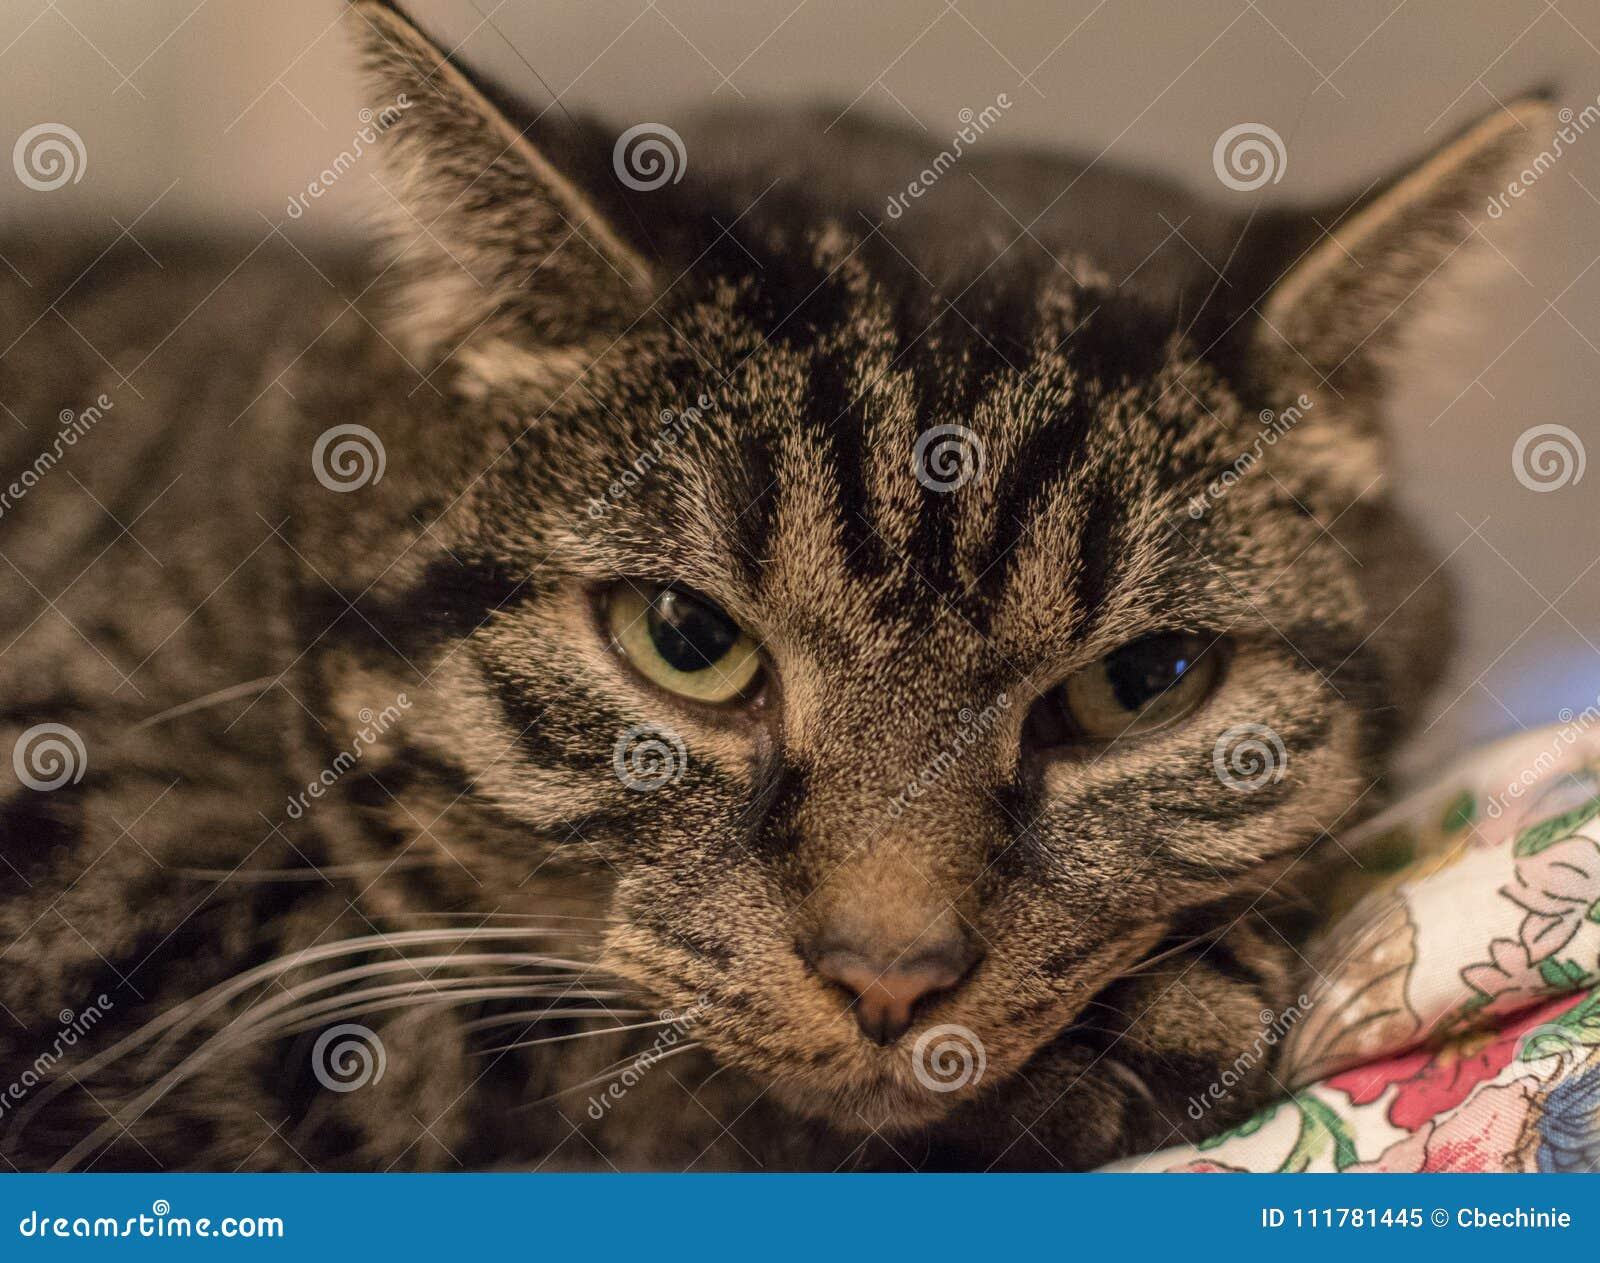 Gato bonito e listrado relaxado imediatamente depois de acordar